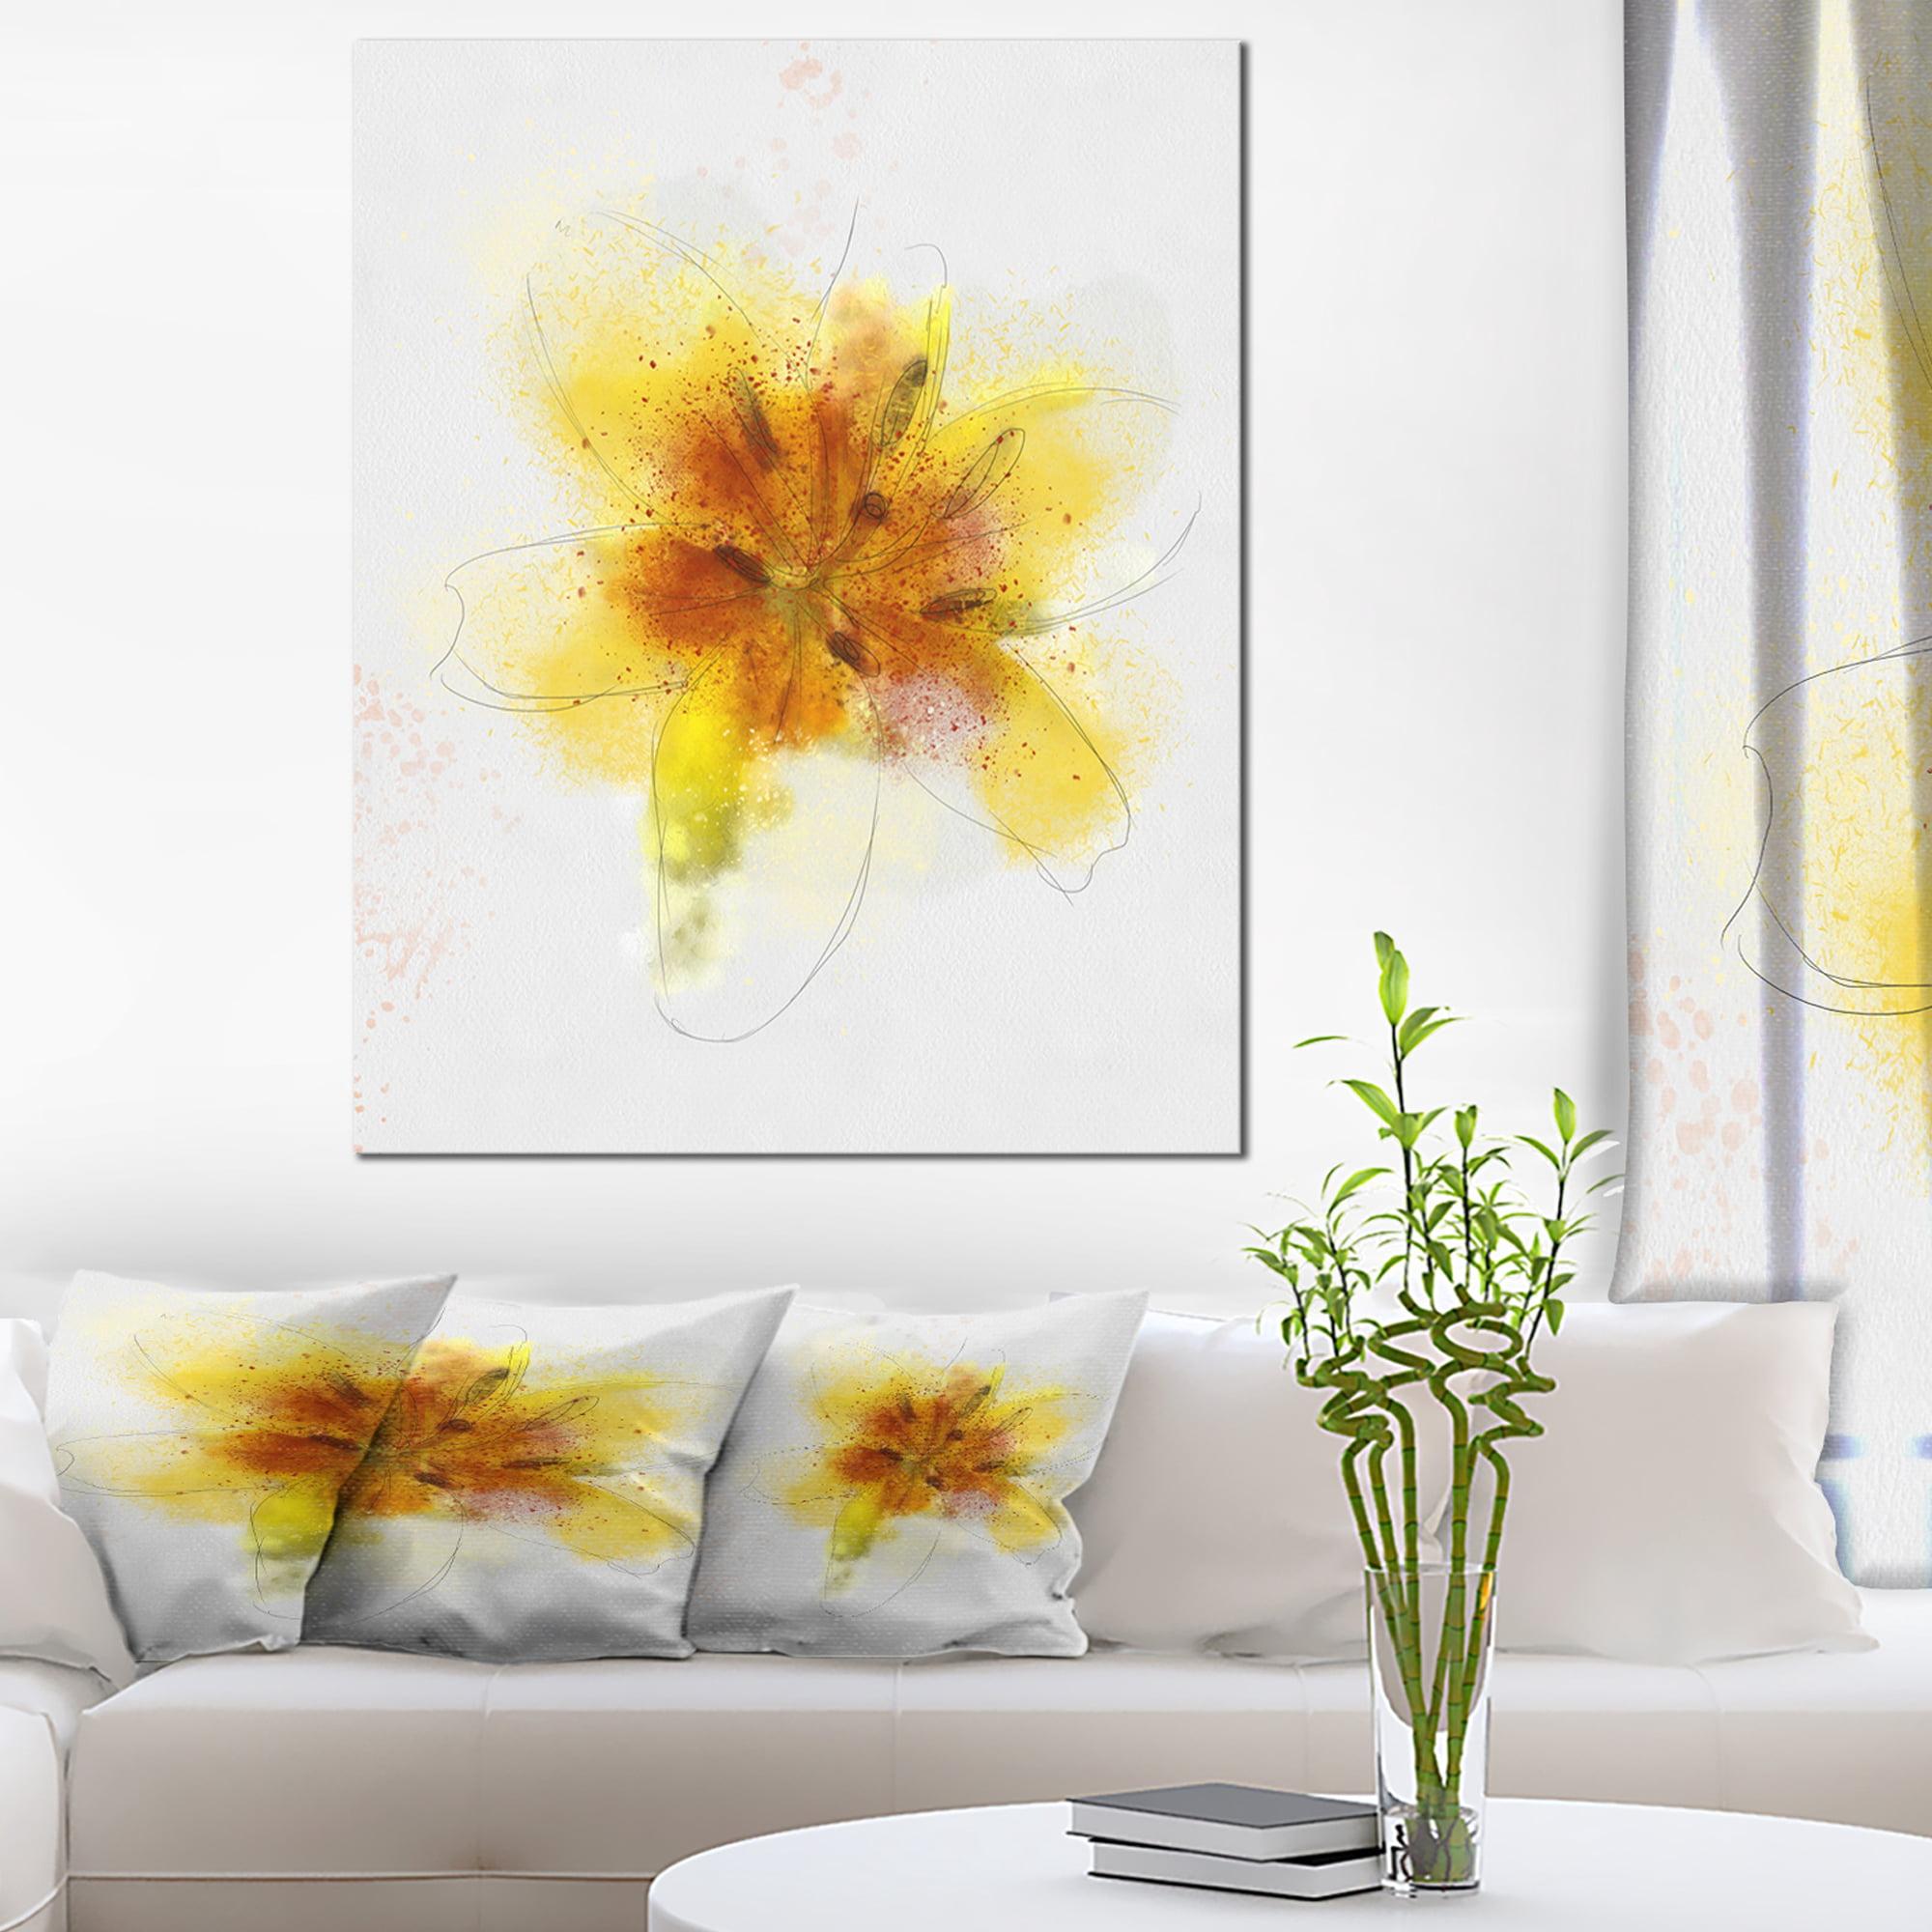 Yellow Flower Sketch on White - Flower Artwork on Canvas